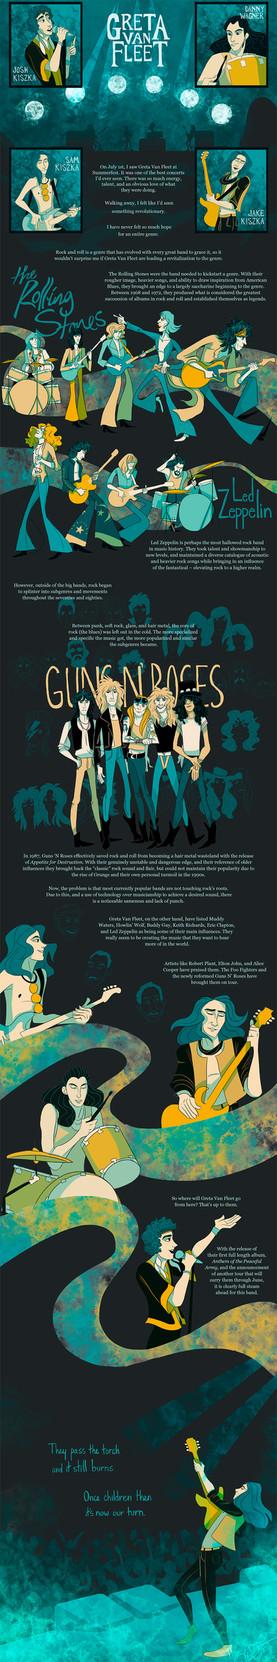 Greta Van Fleet / Rock and Roll History